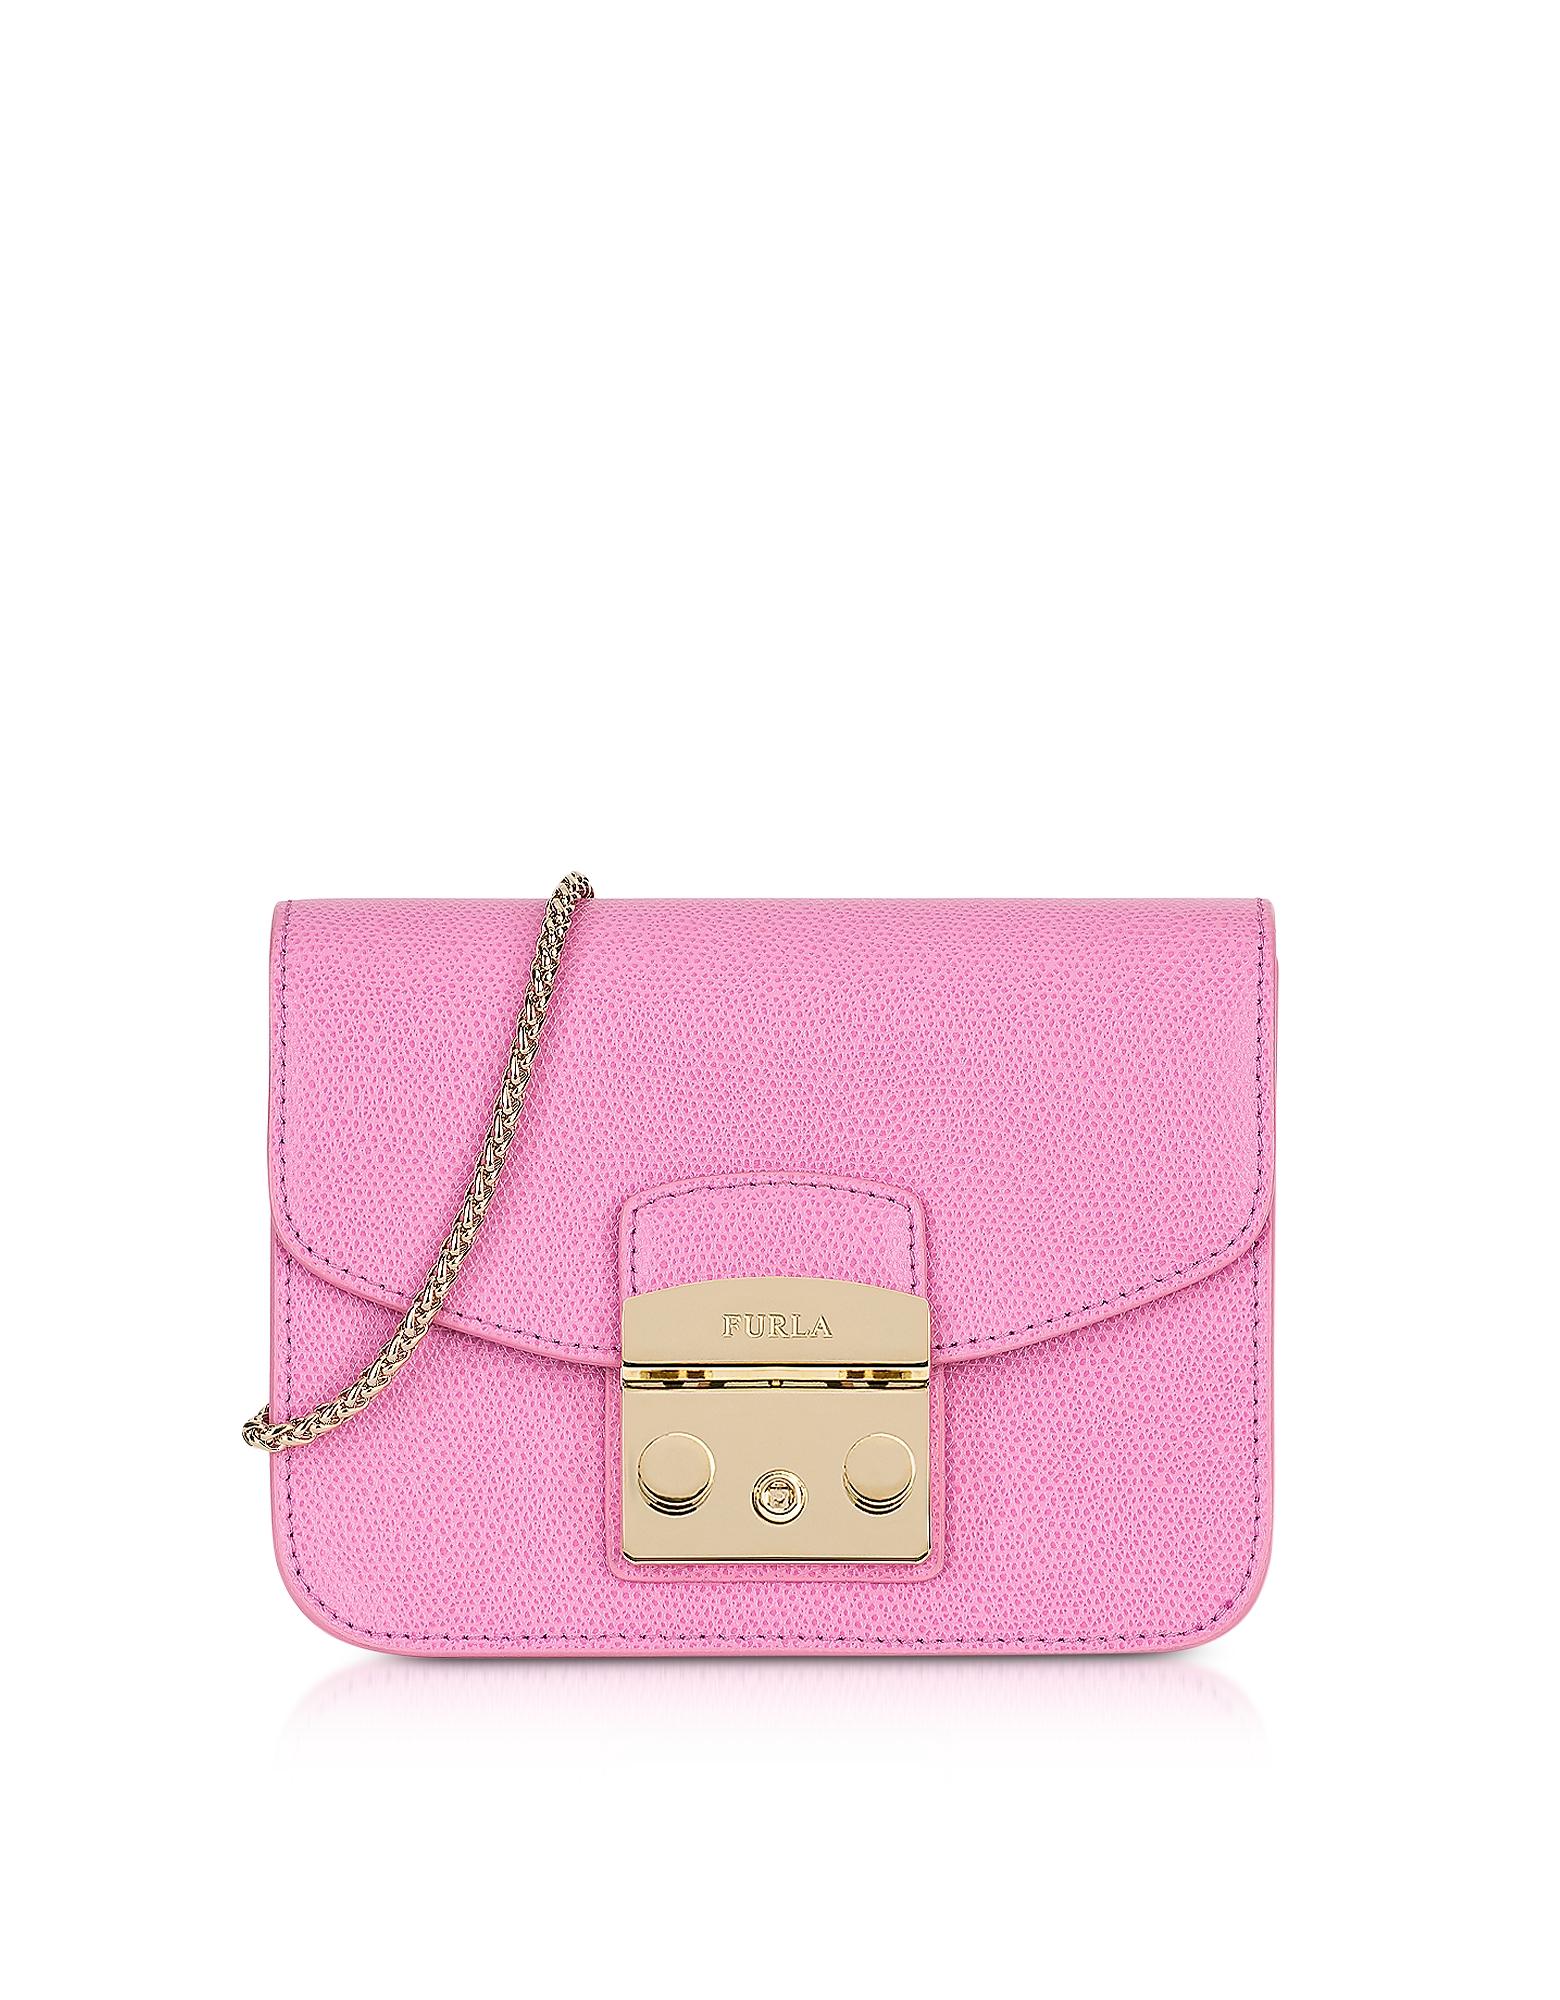 Furla Handbags, Orchid Leather Metropolis Mini Crossbody Bag